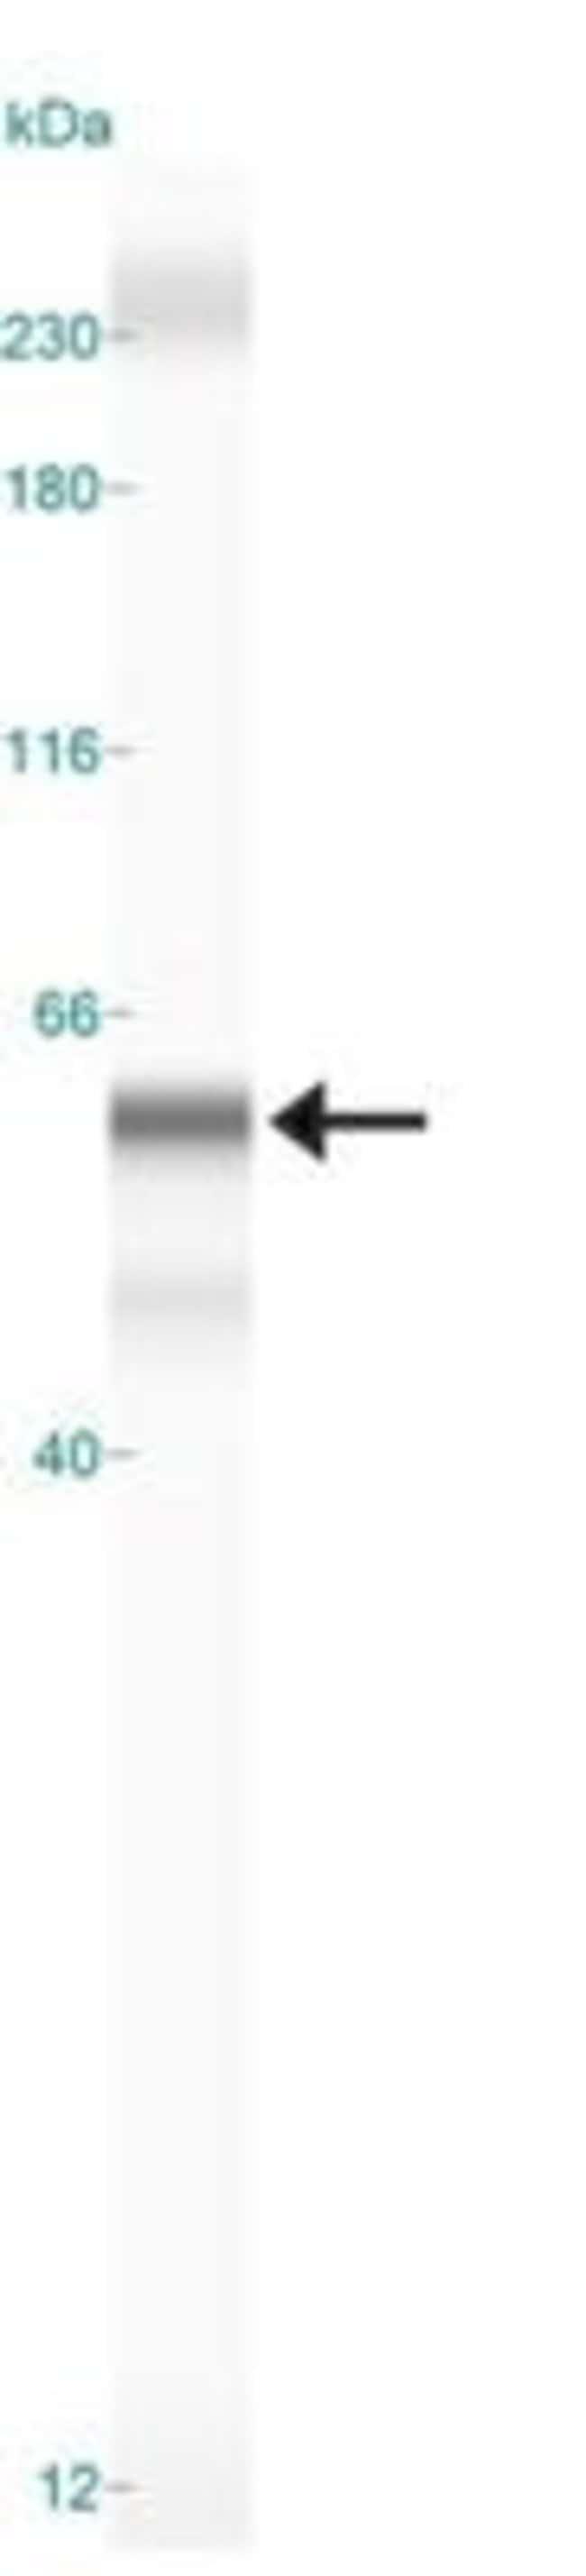 anti-DEC2/SHARP1, Polyclonal, Novus Biologicals:Antibodies:Primary Antibodies